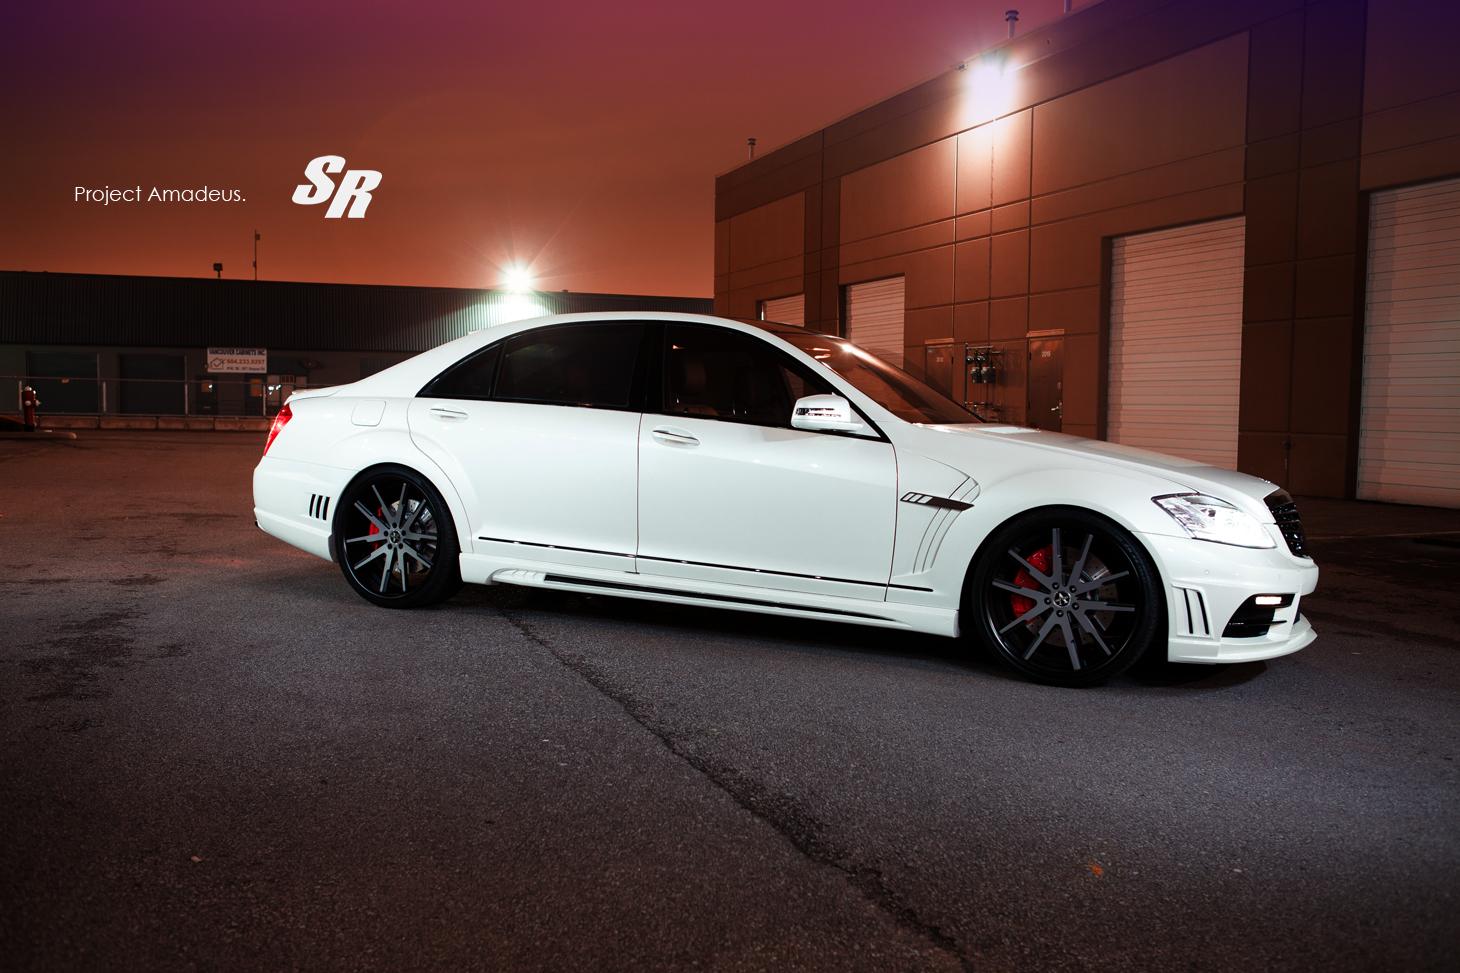 Projcet Amadeus Sr Auto Mercedes Benz S63 Amg